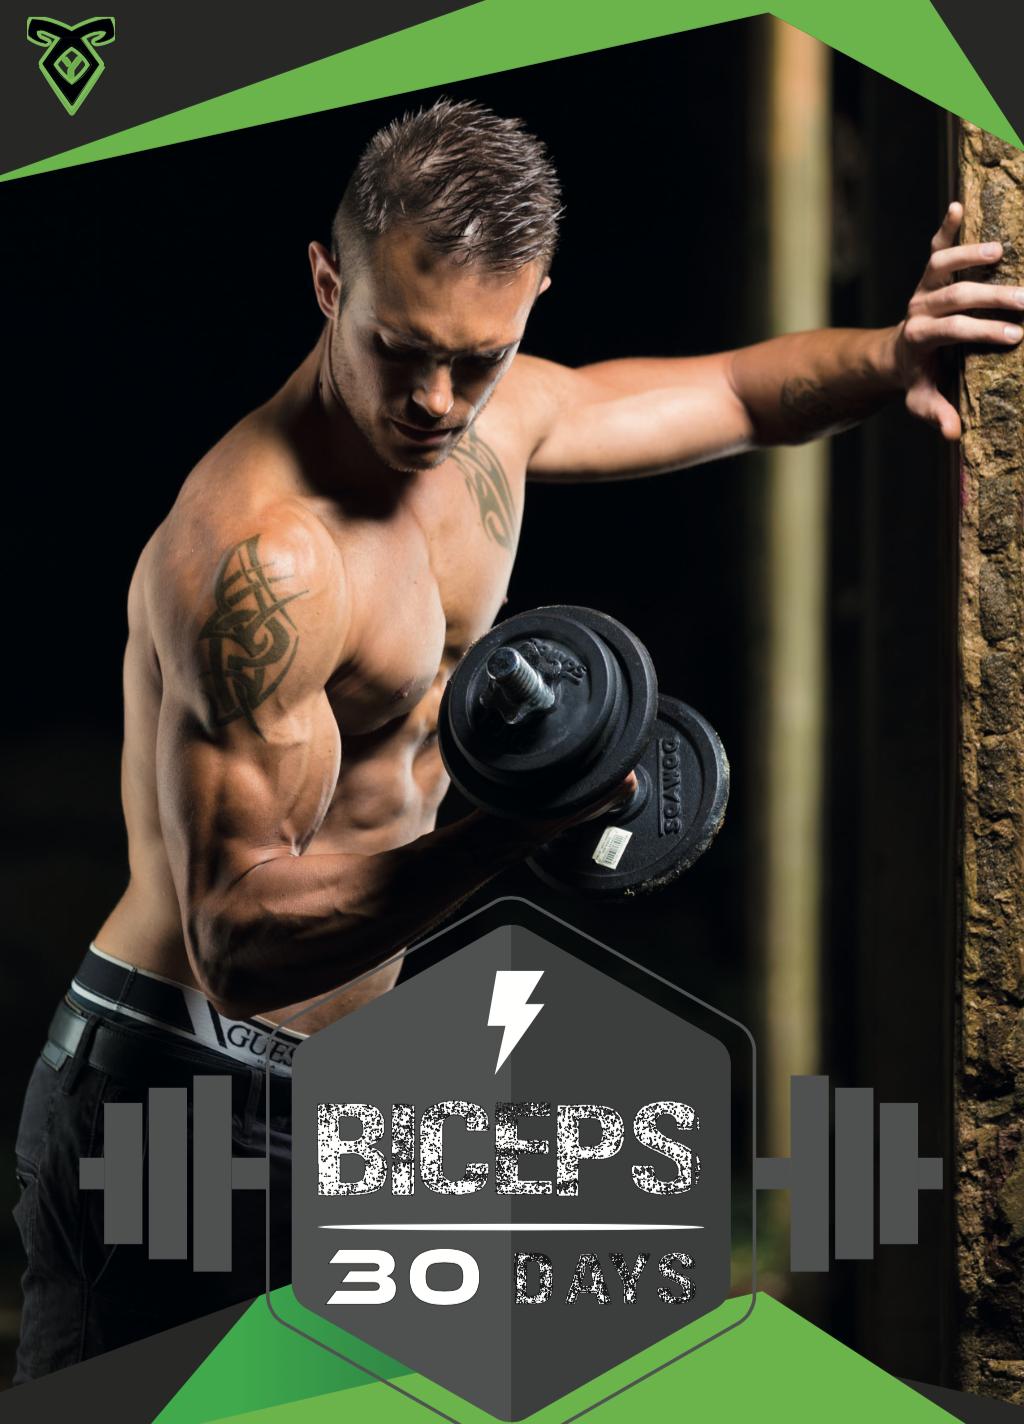 Ebook Biceps 30 Days